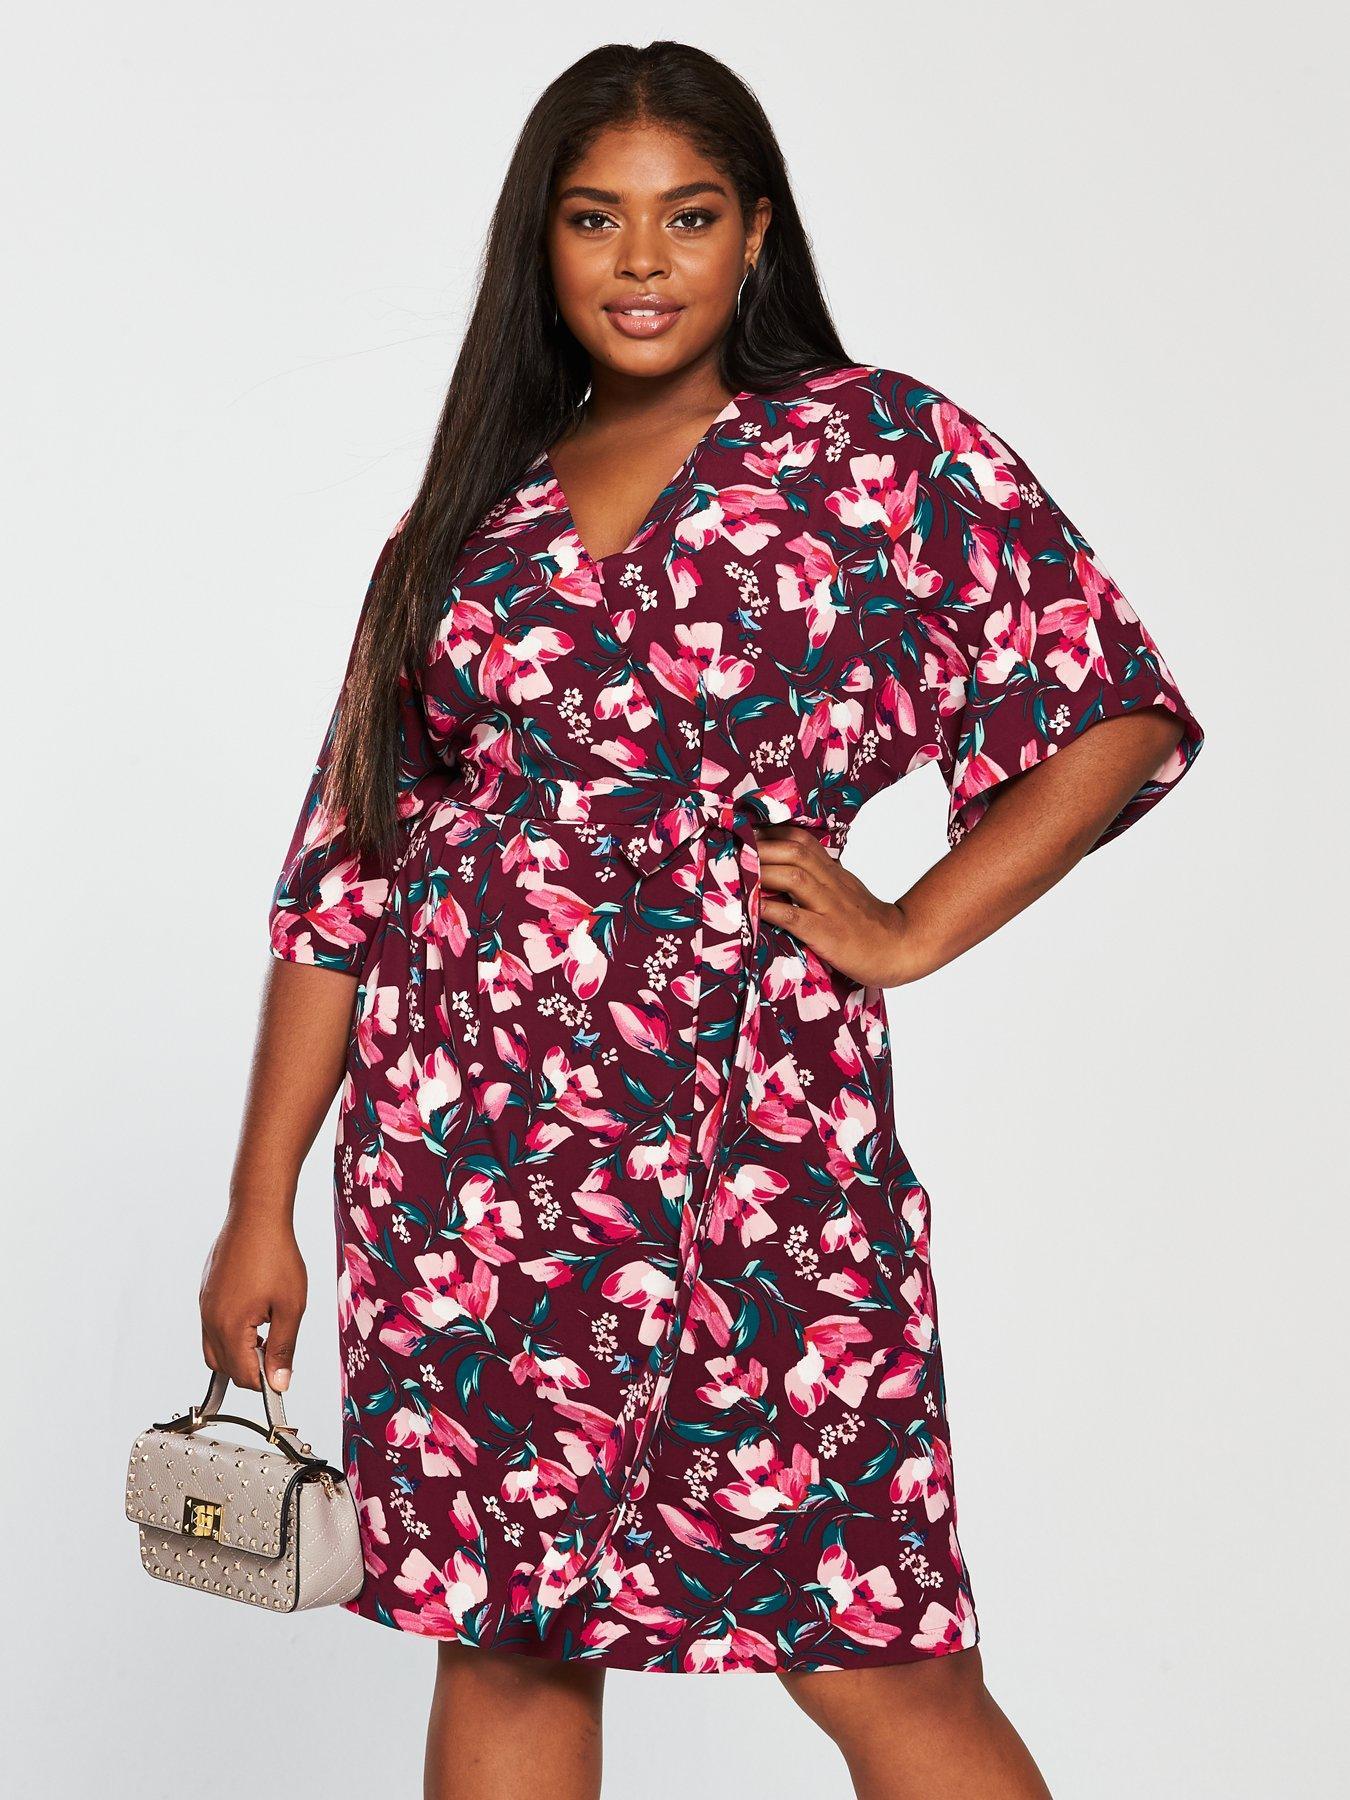 cheap online dresses